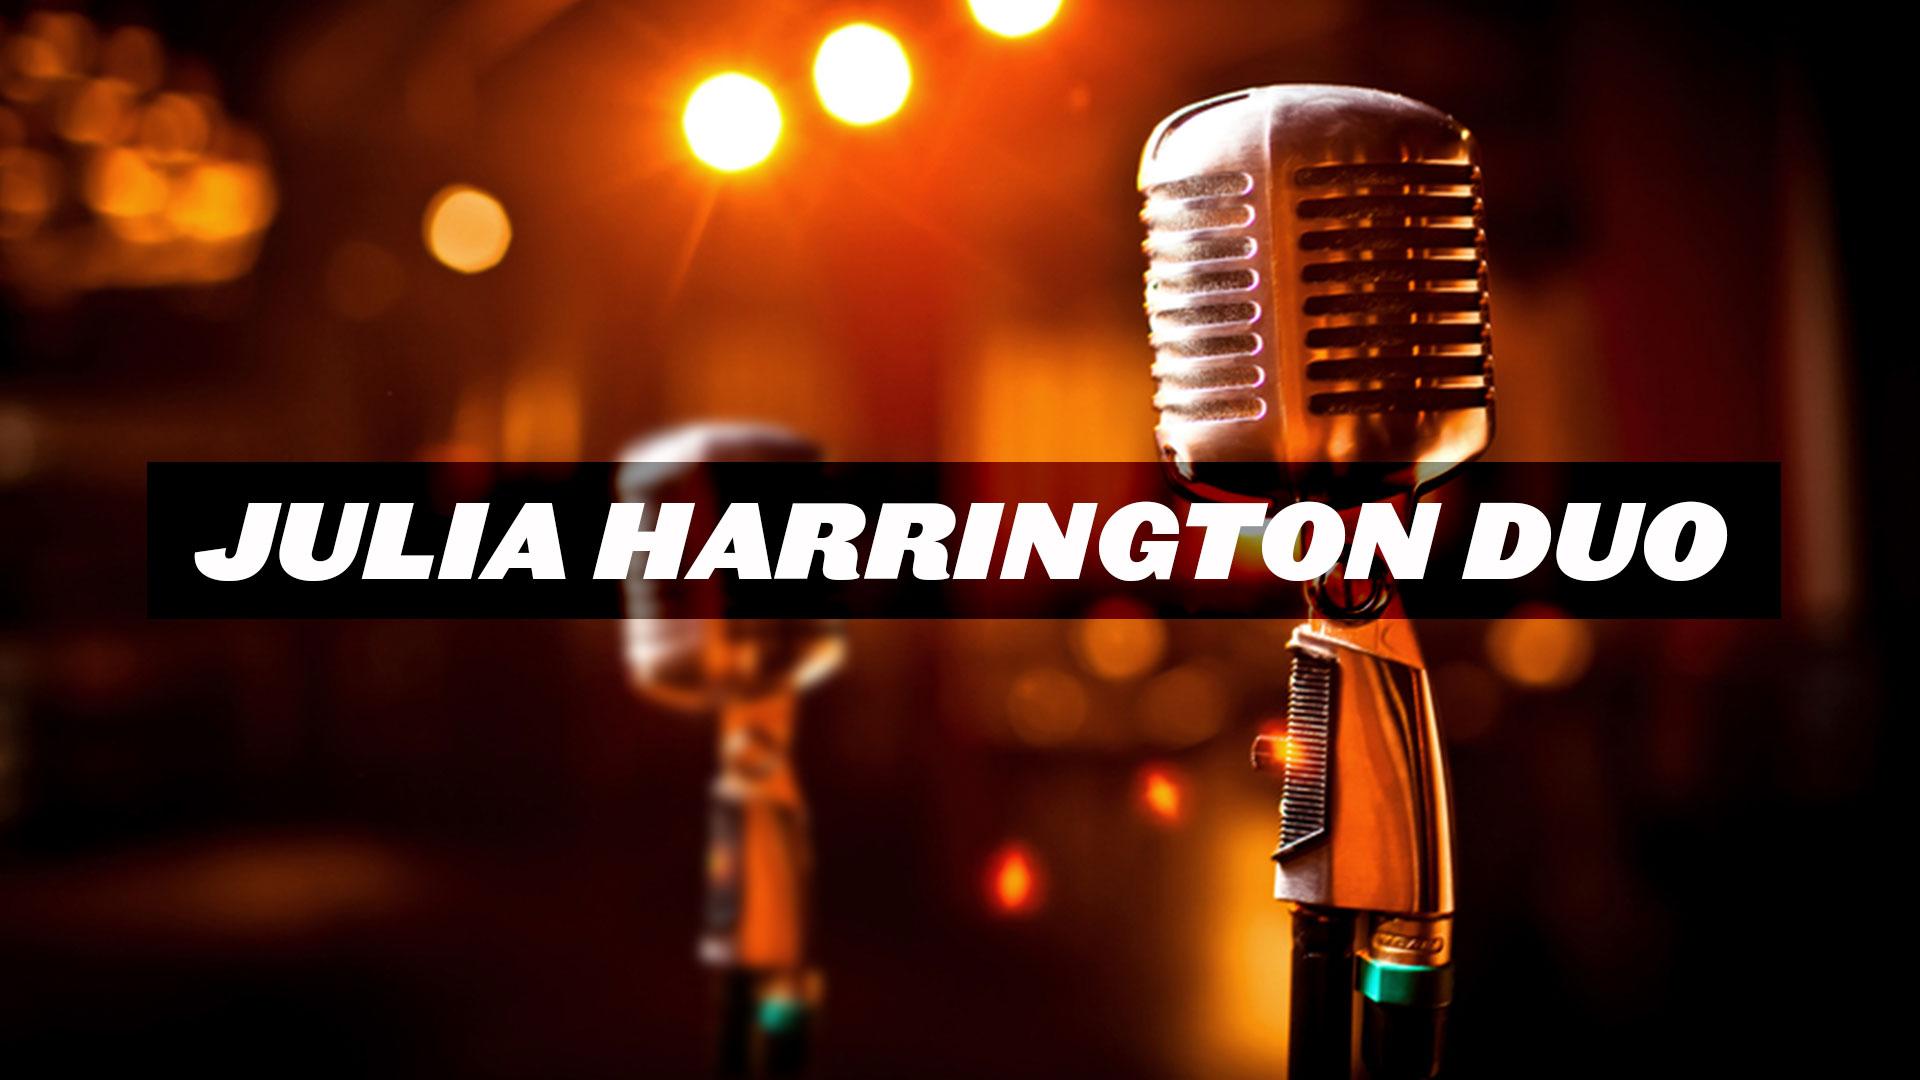 julia-harrington-duo.jpg